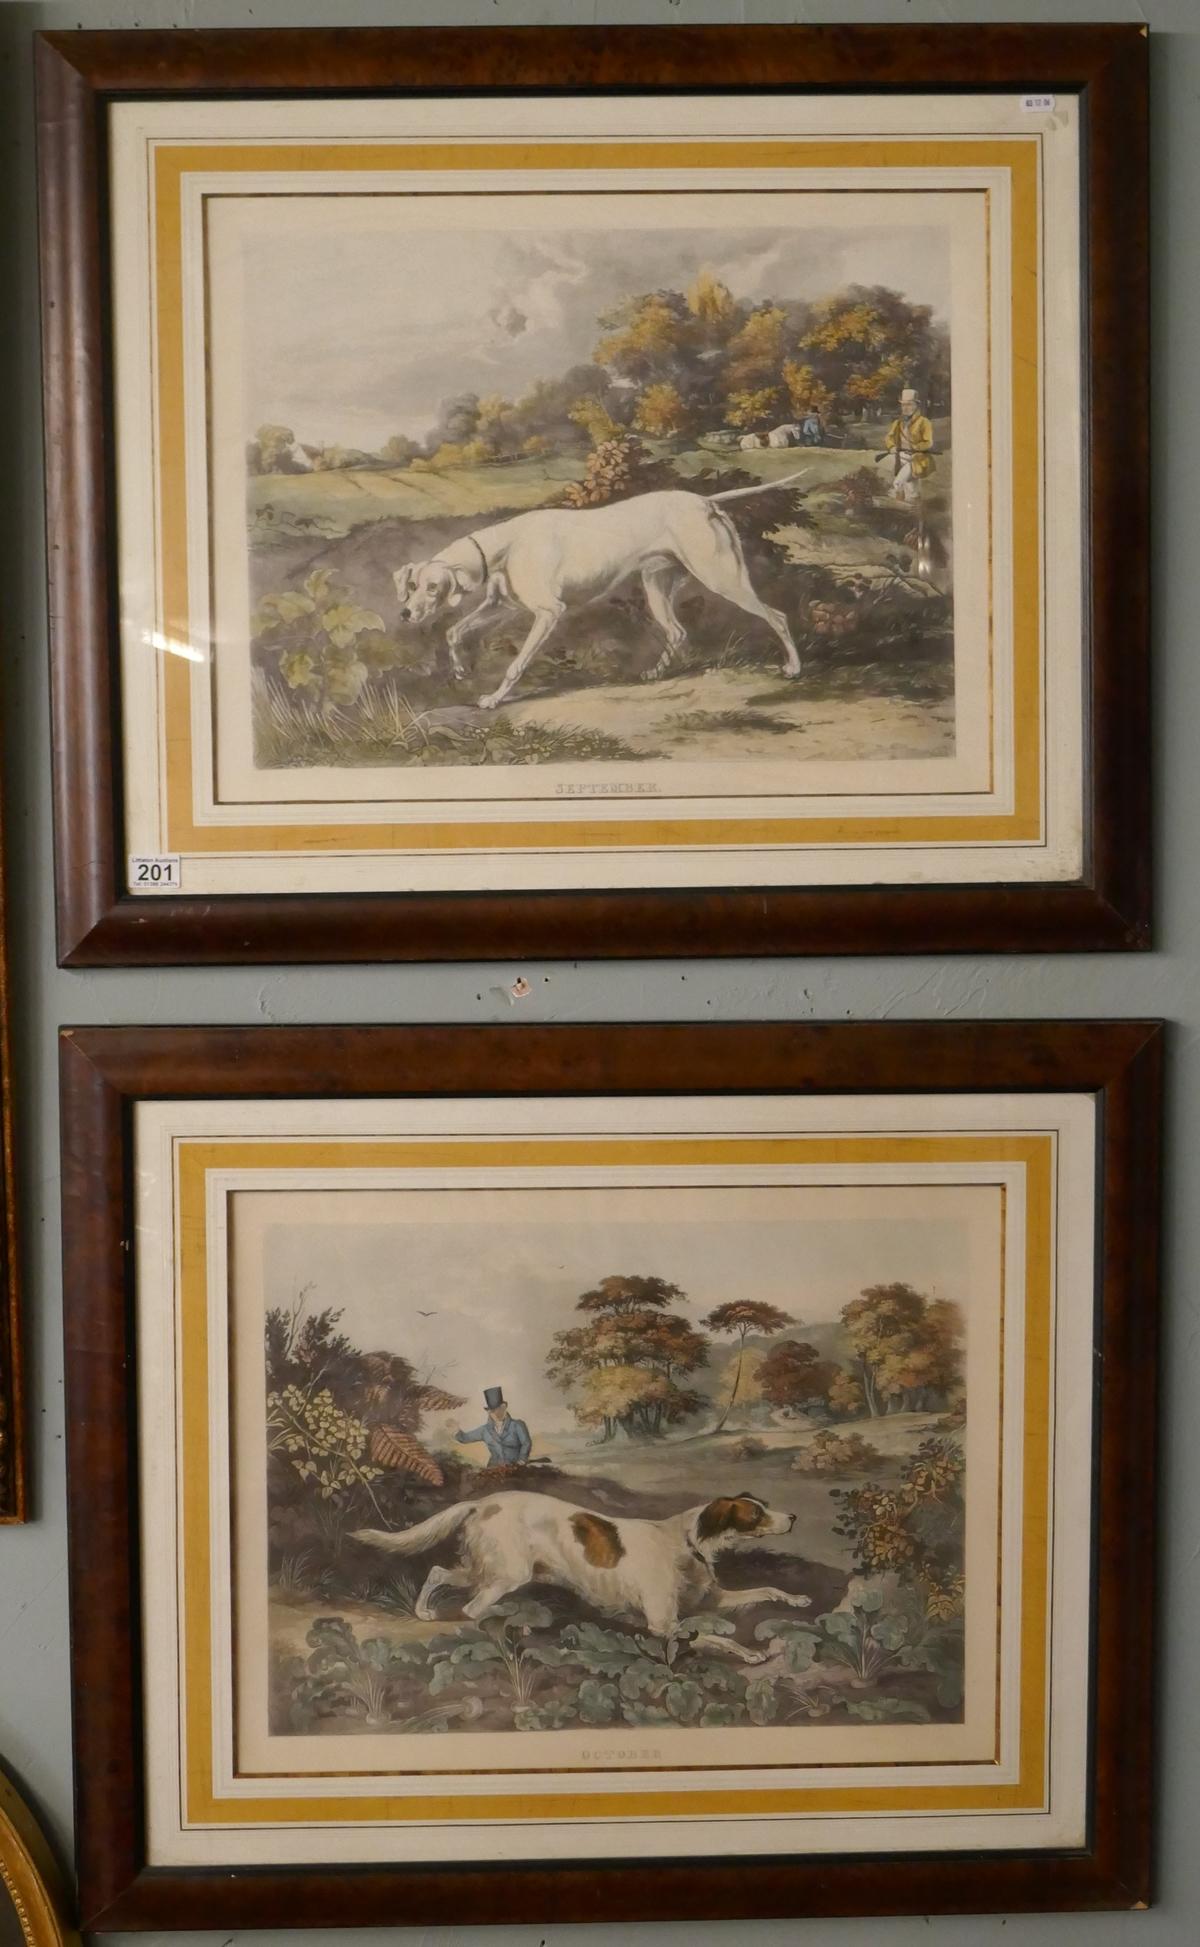 Pair of hunting prints entitled September & October